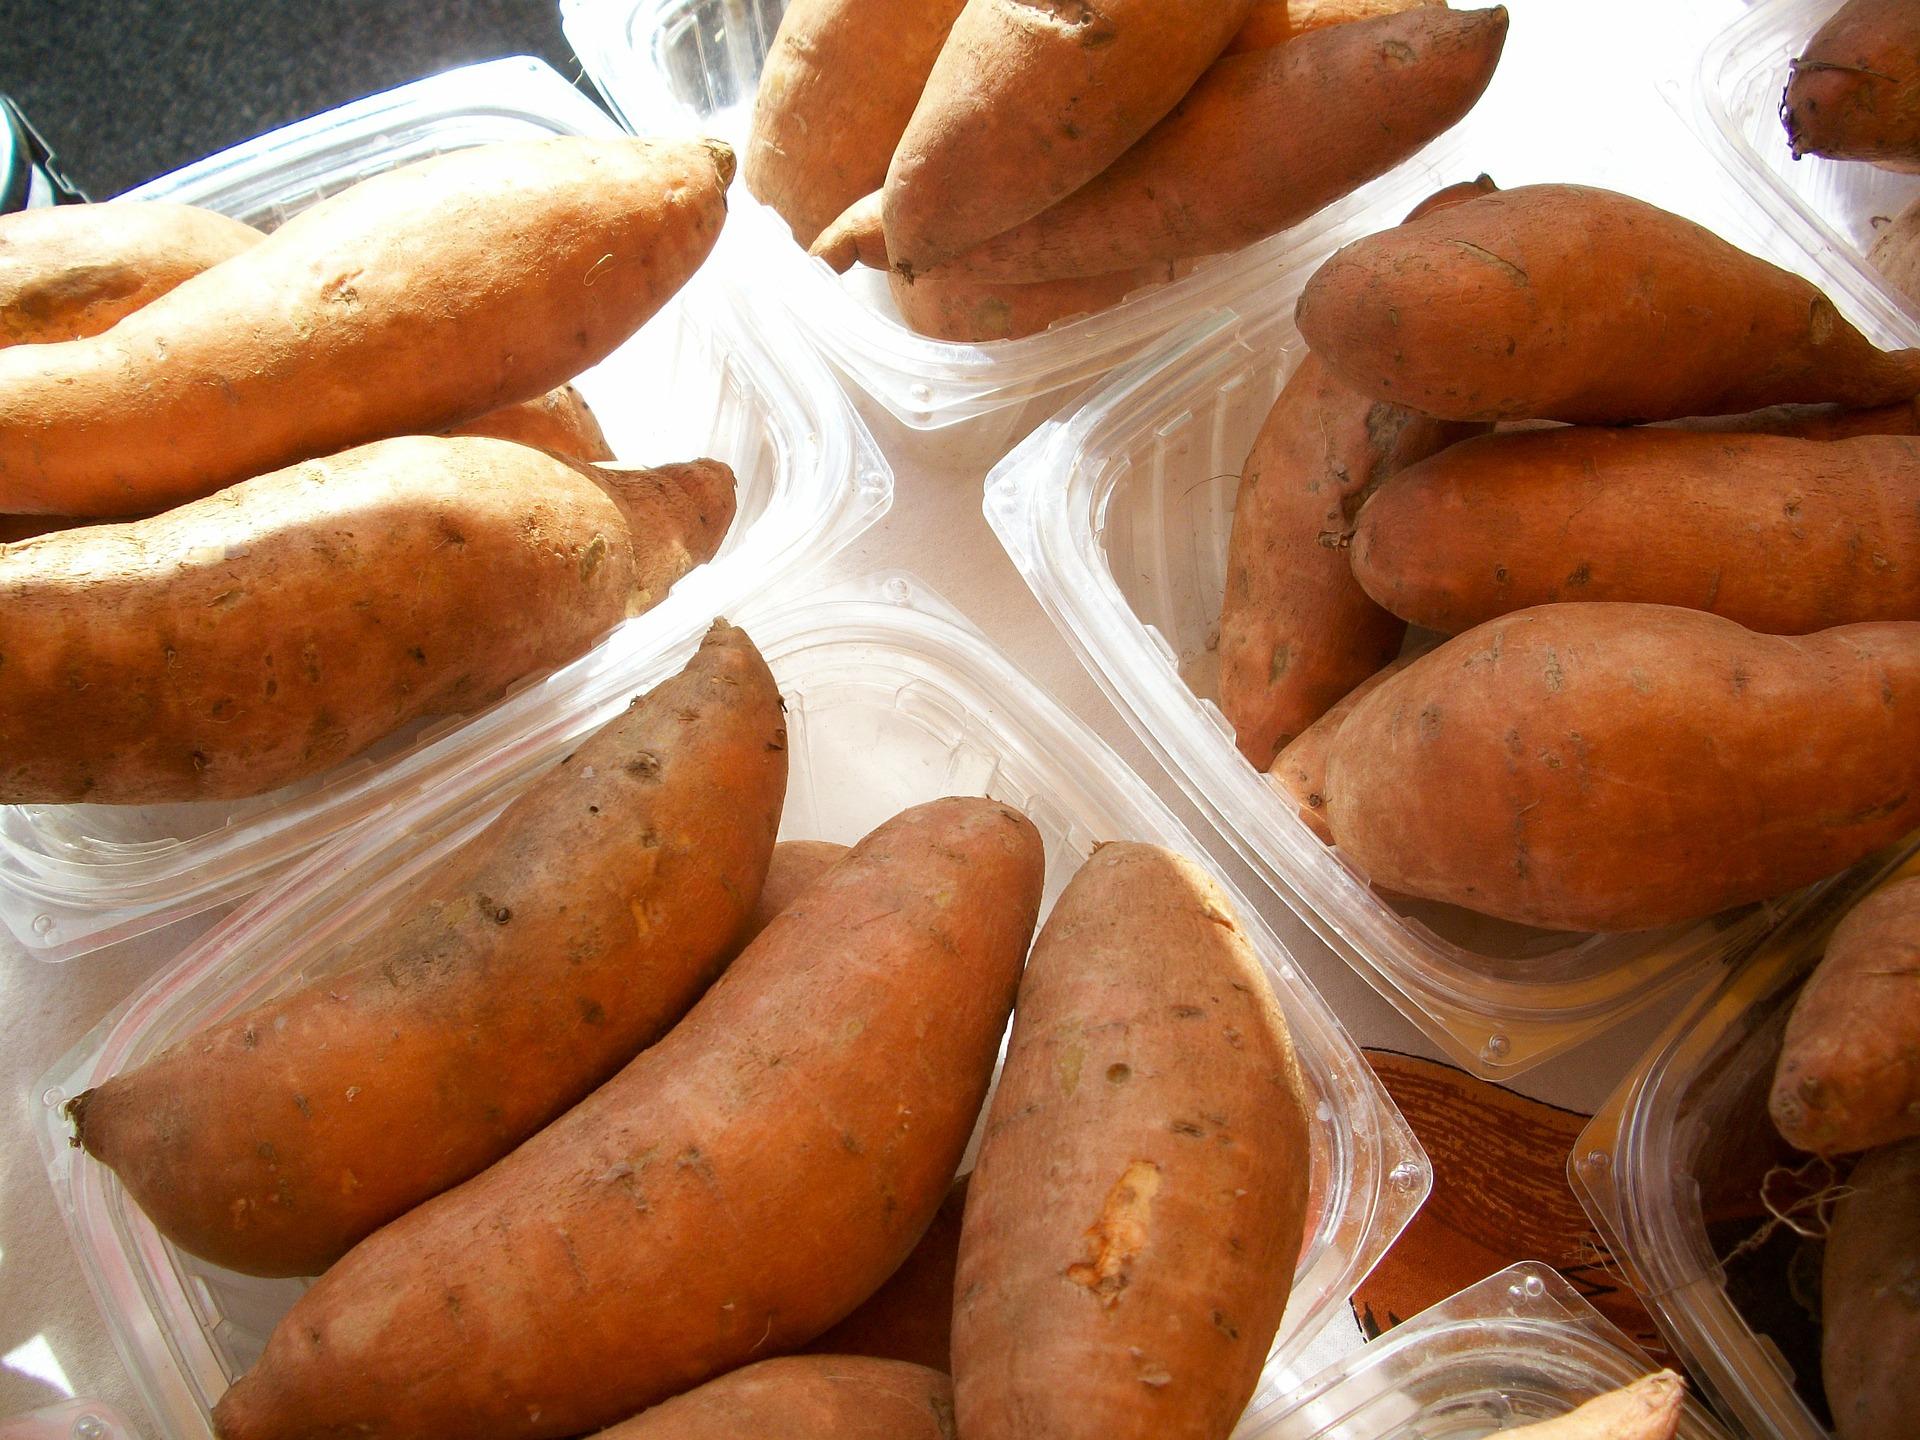 sweet-potatoes-996_1920.jpg